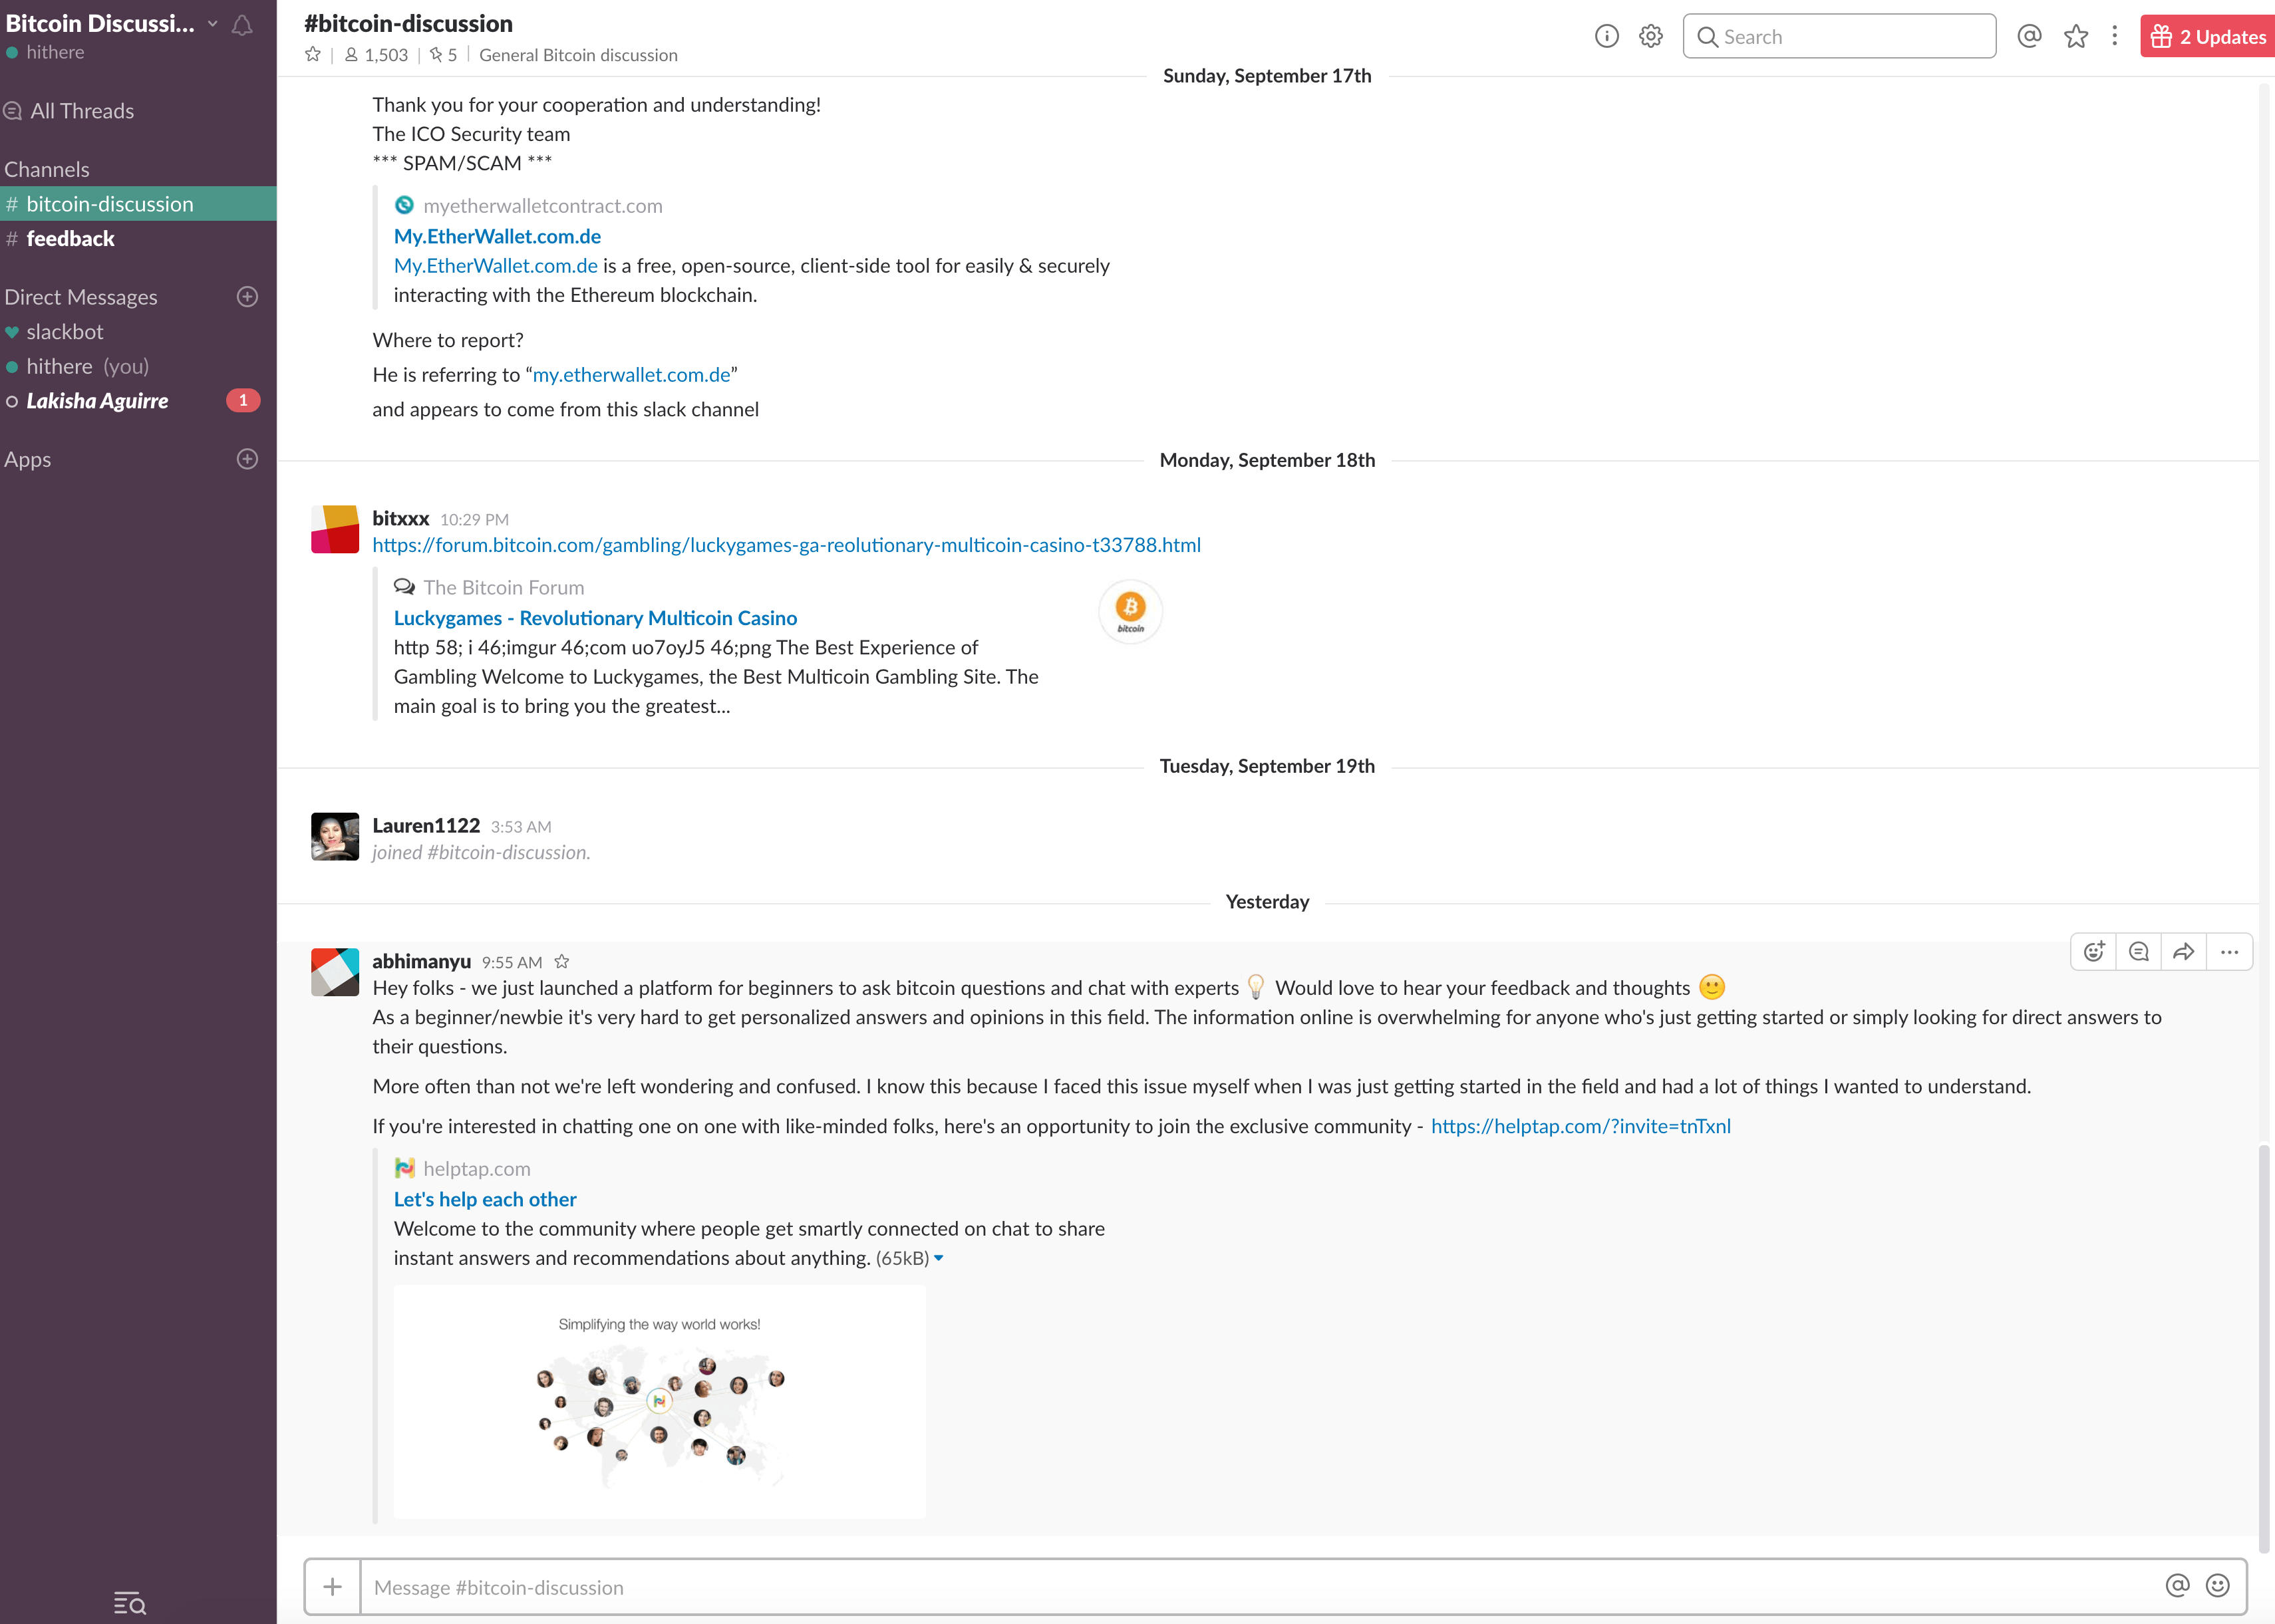 https://bitcoinpub.slack.com